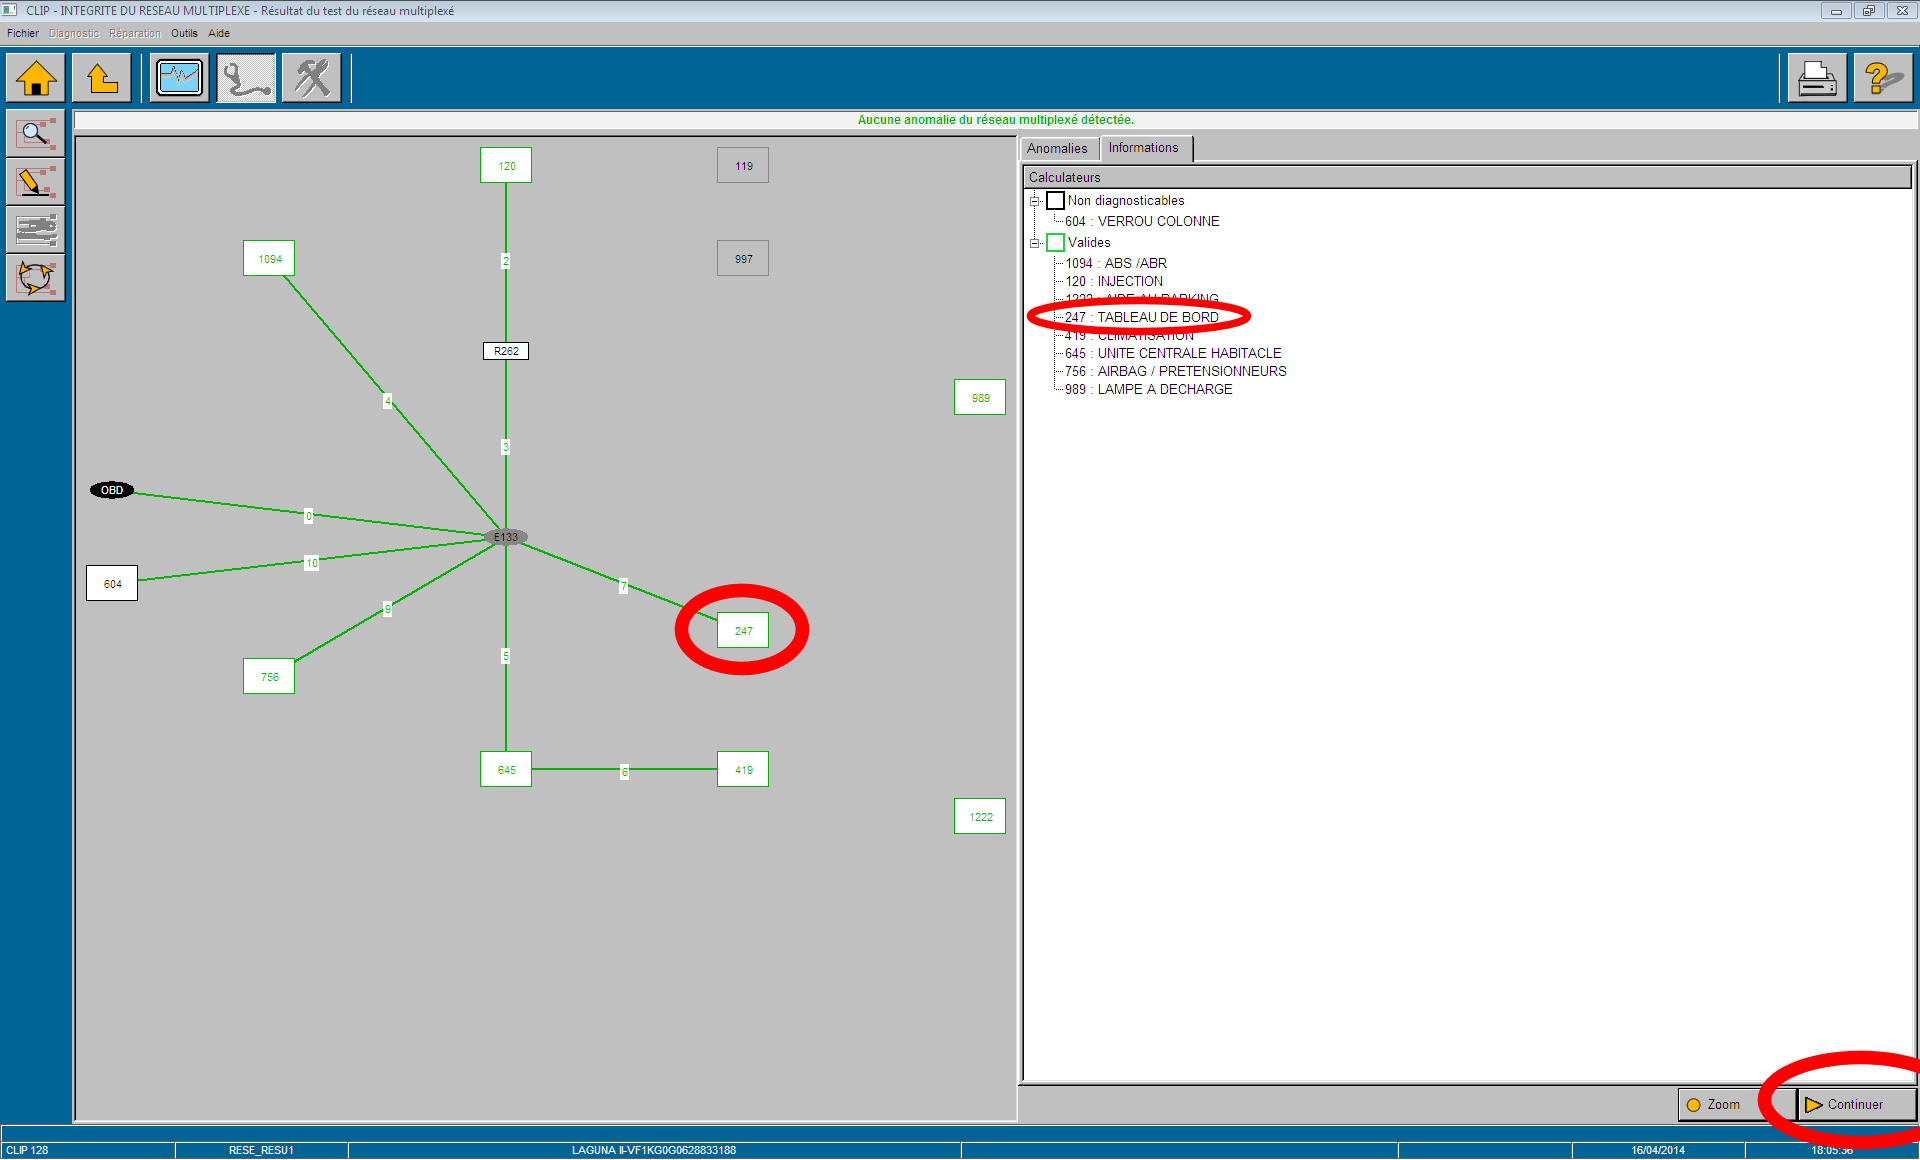 Modif sur intervalle de vidange Reseau_Multiplexe-01